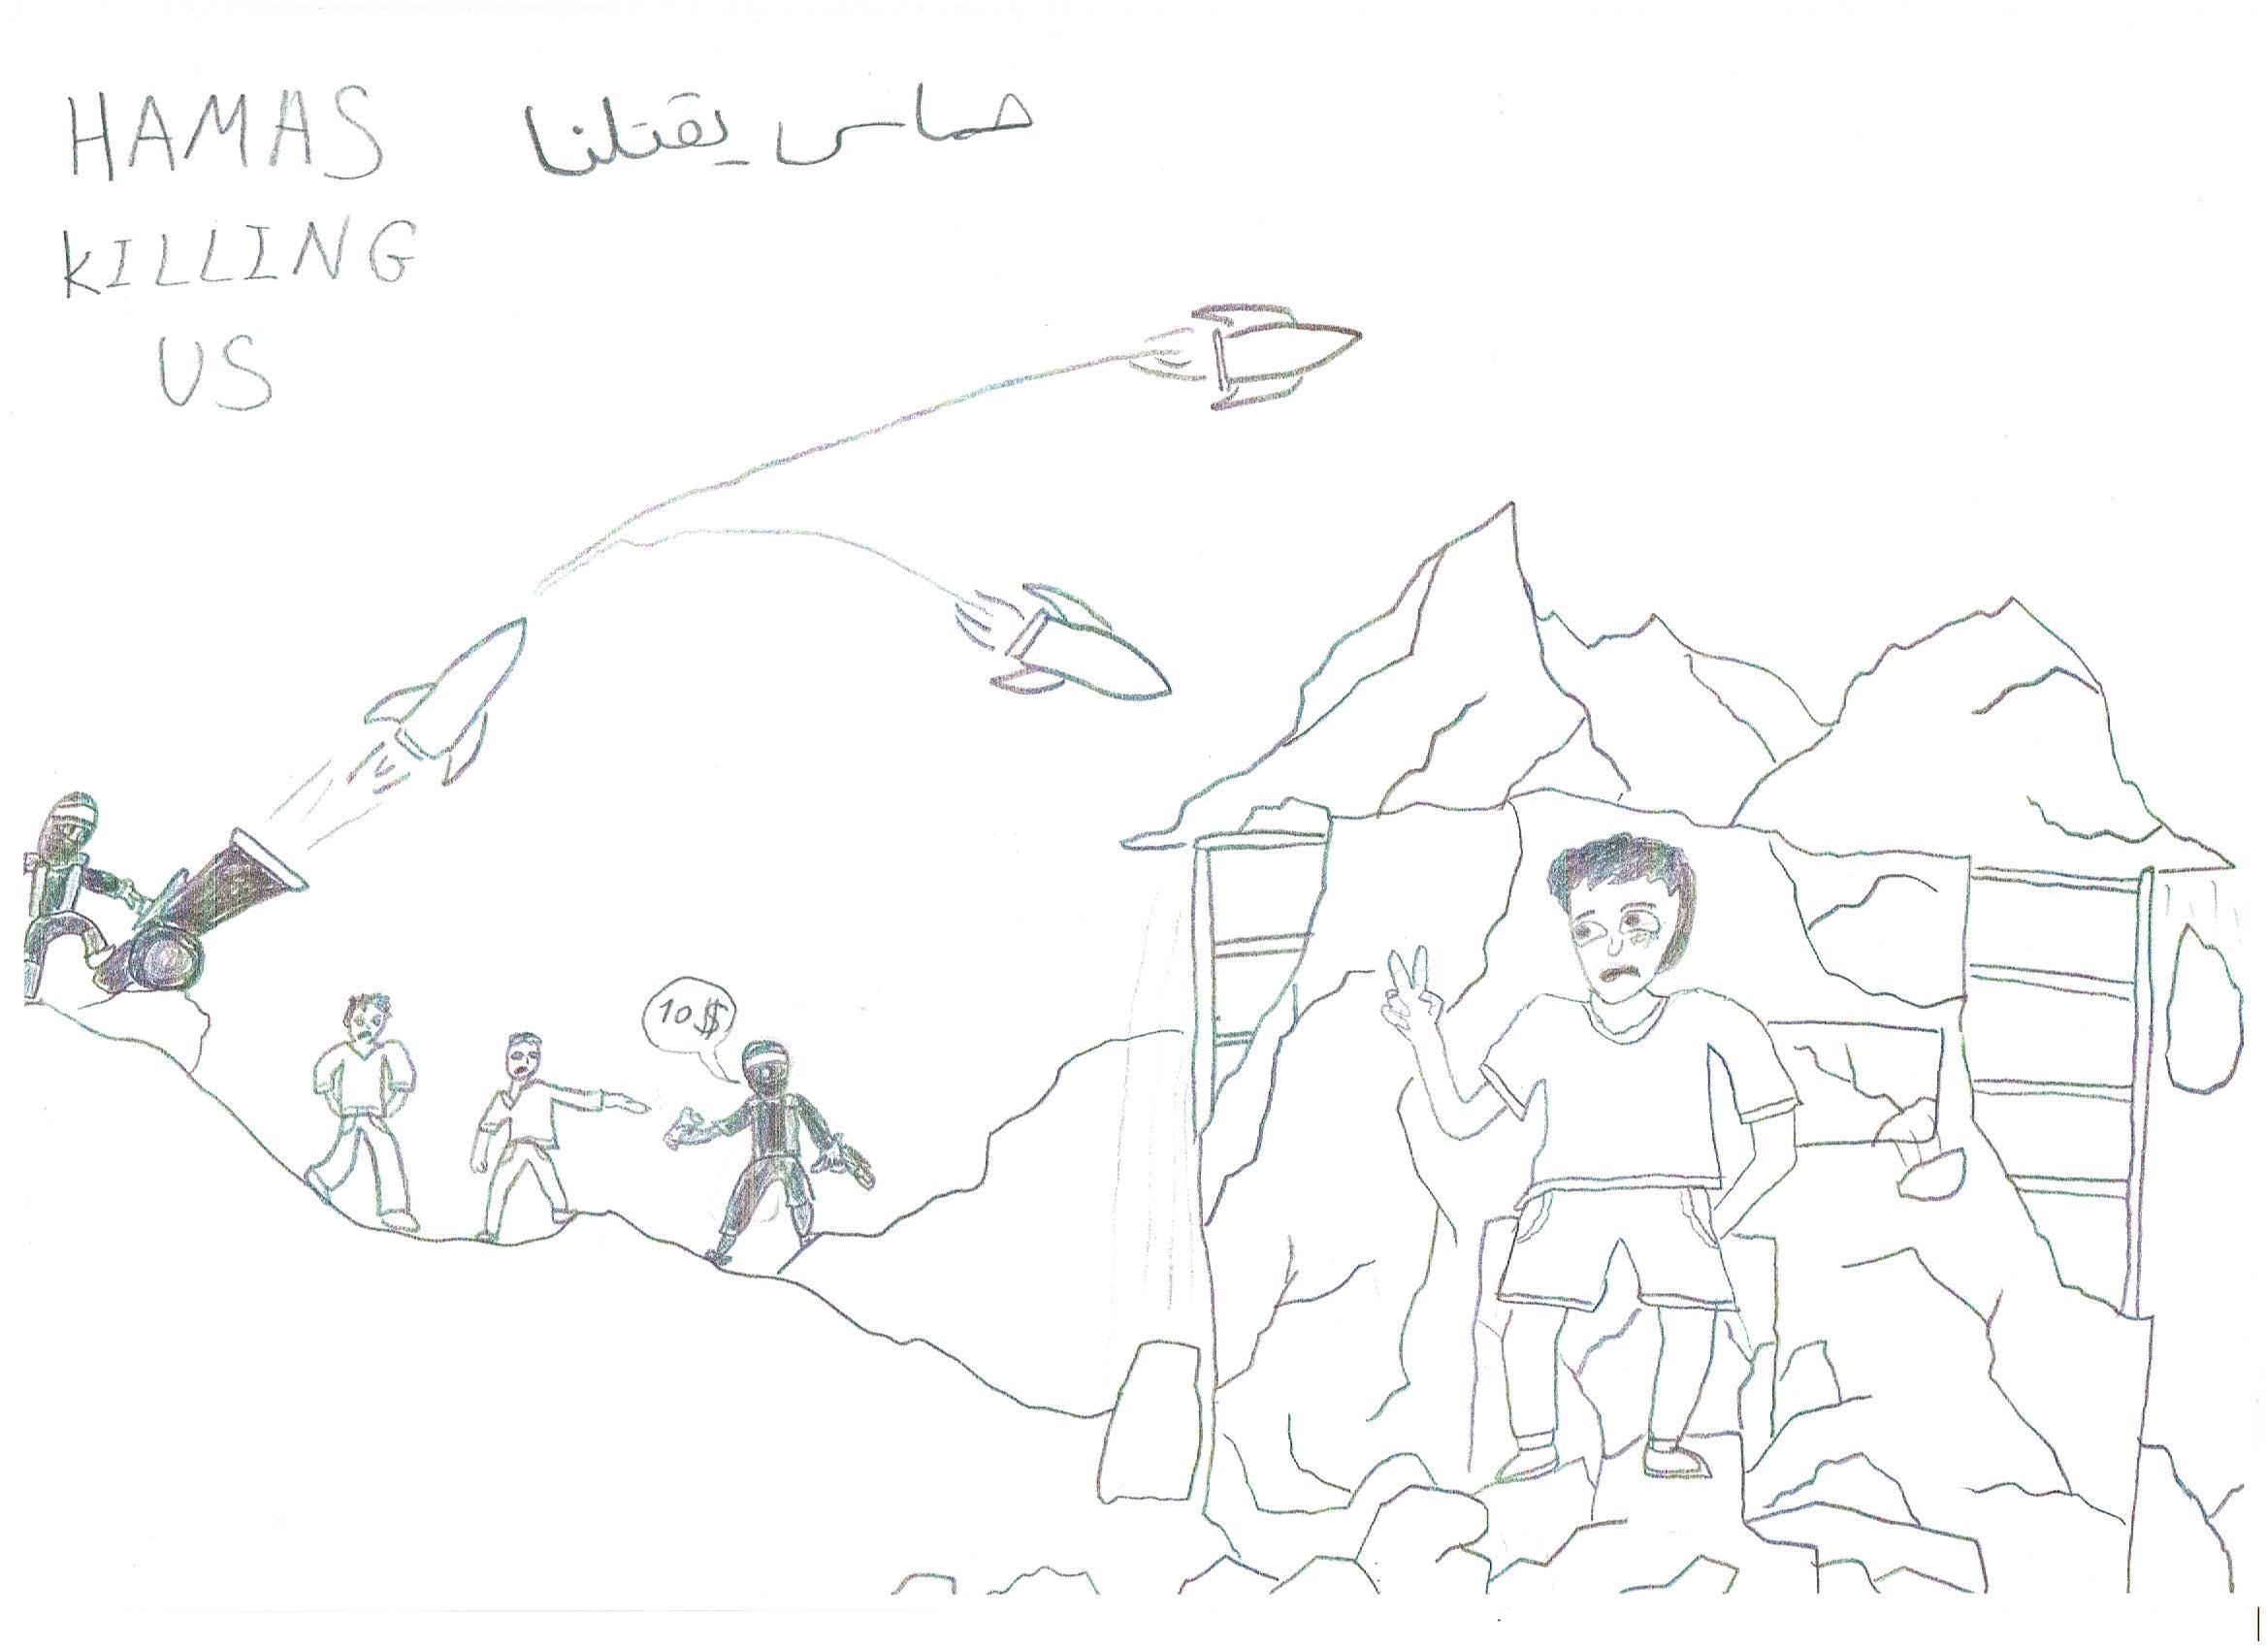 GFATF - My World of Terror - Ahmed - 15year old